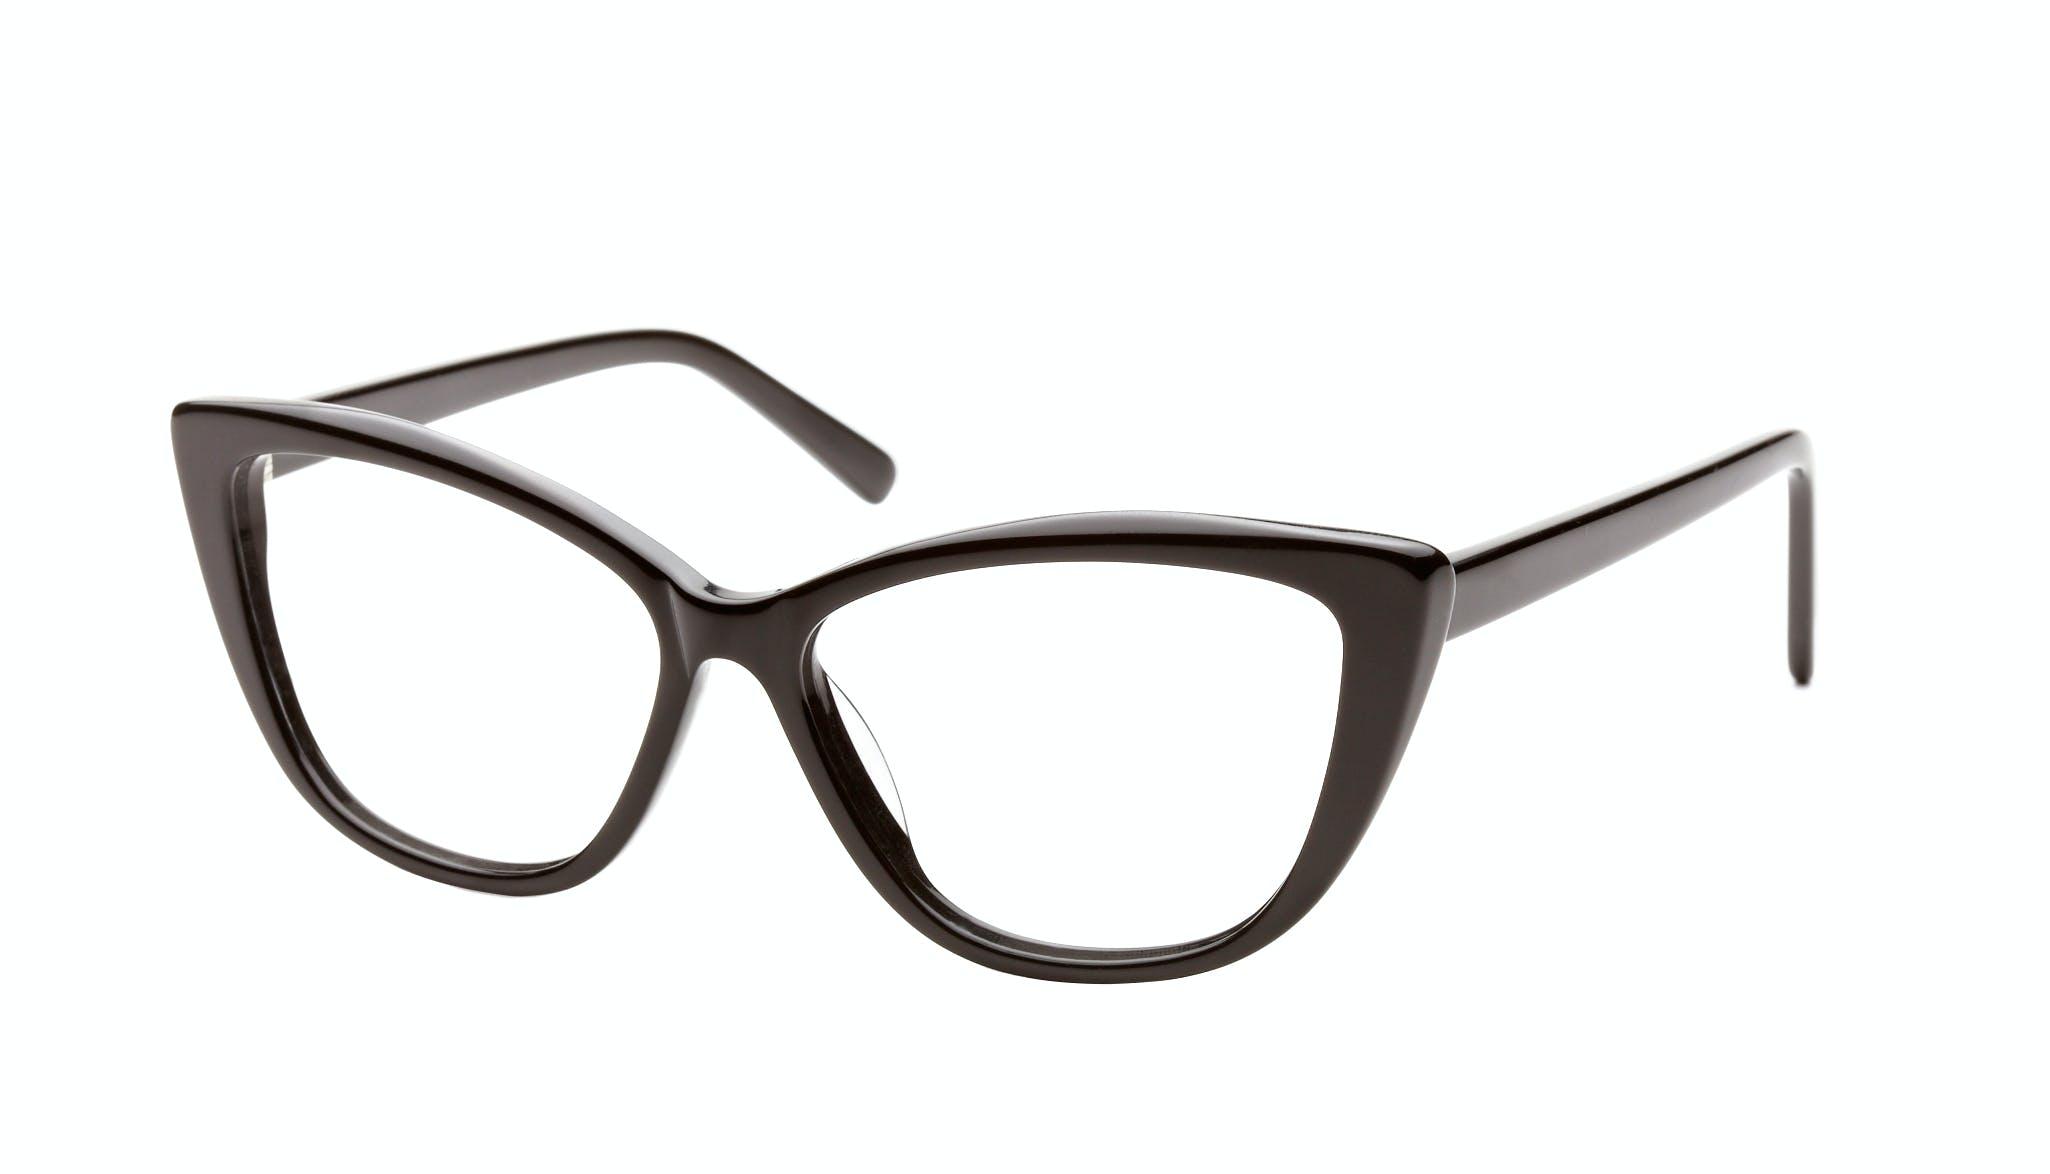 Affordable Fashion Glasses Cat Eye Daring Cateye Eyeglasses Women Dolled Up Black Tilt